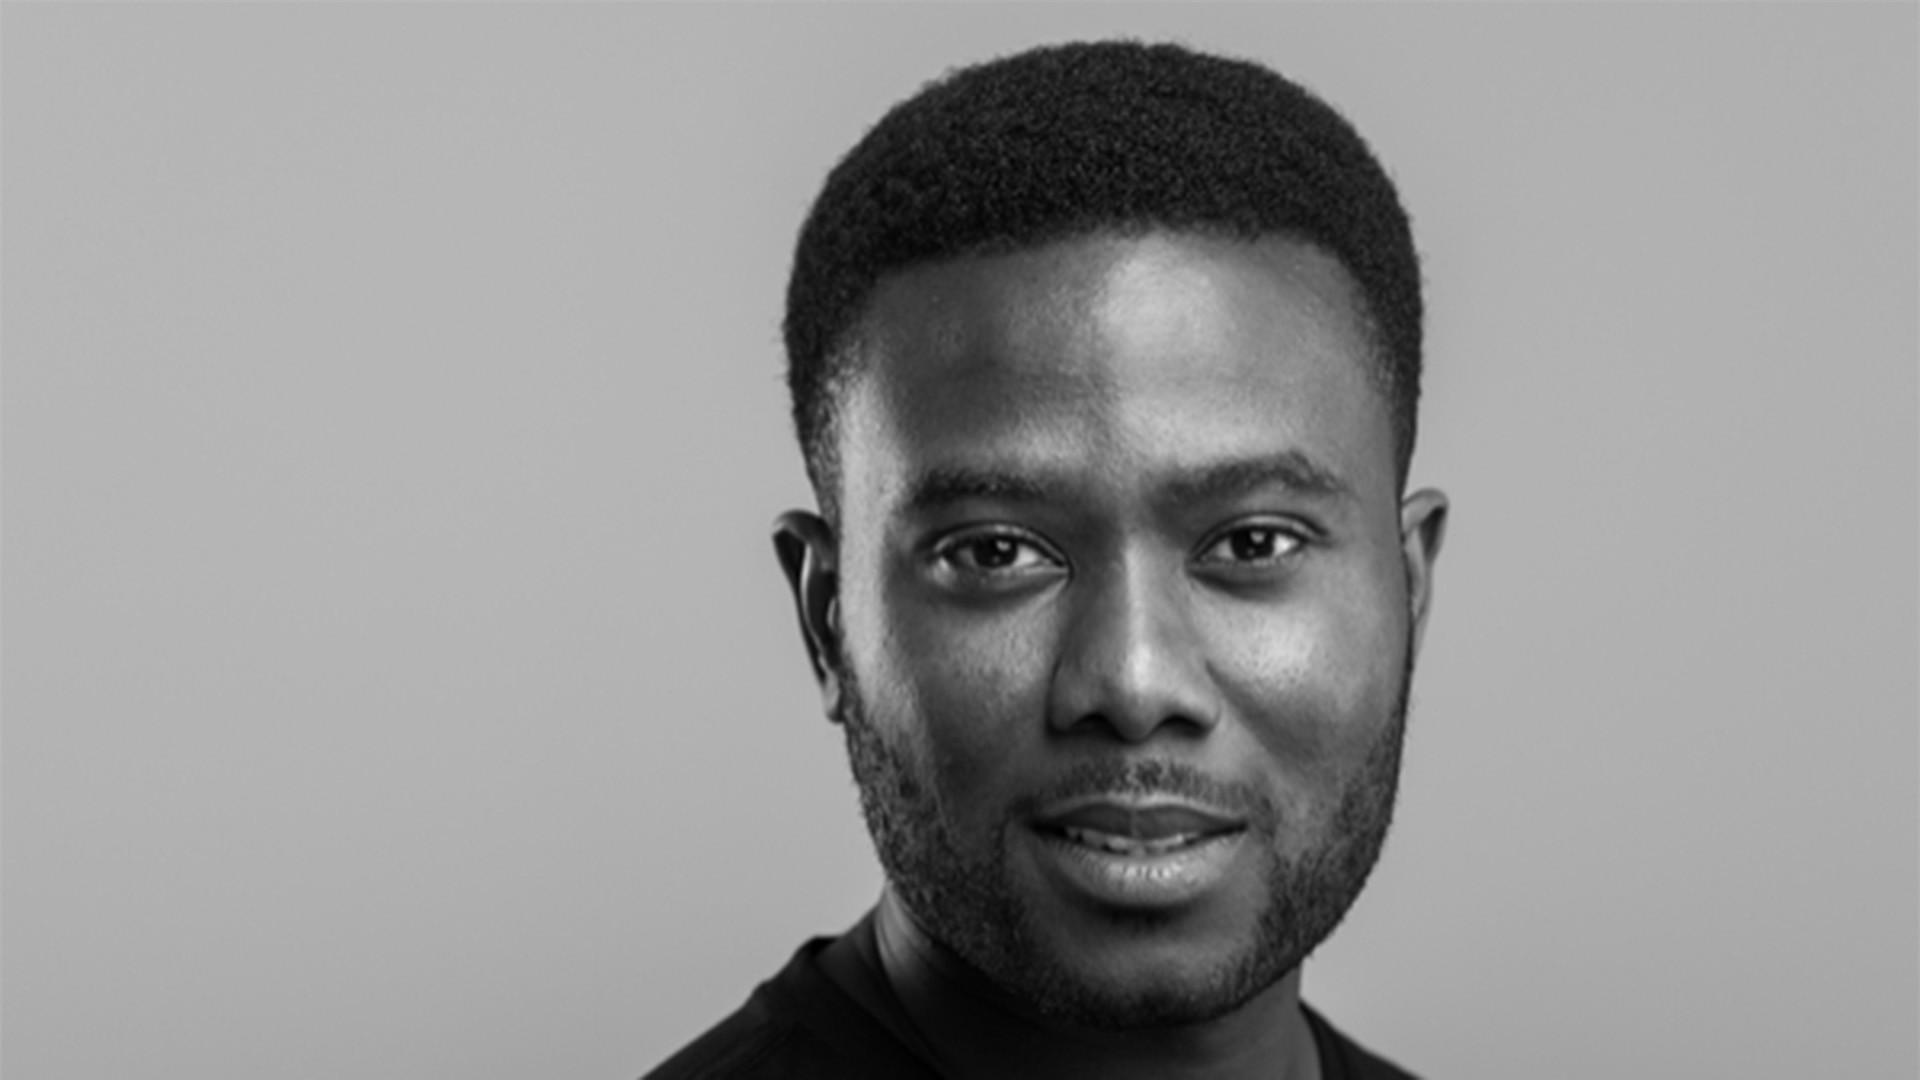 Kenny Alegbe HomeHero founder